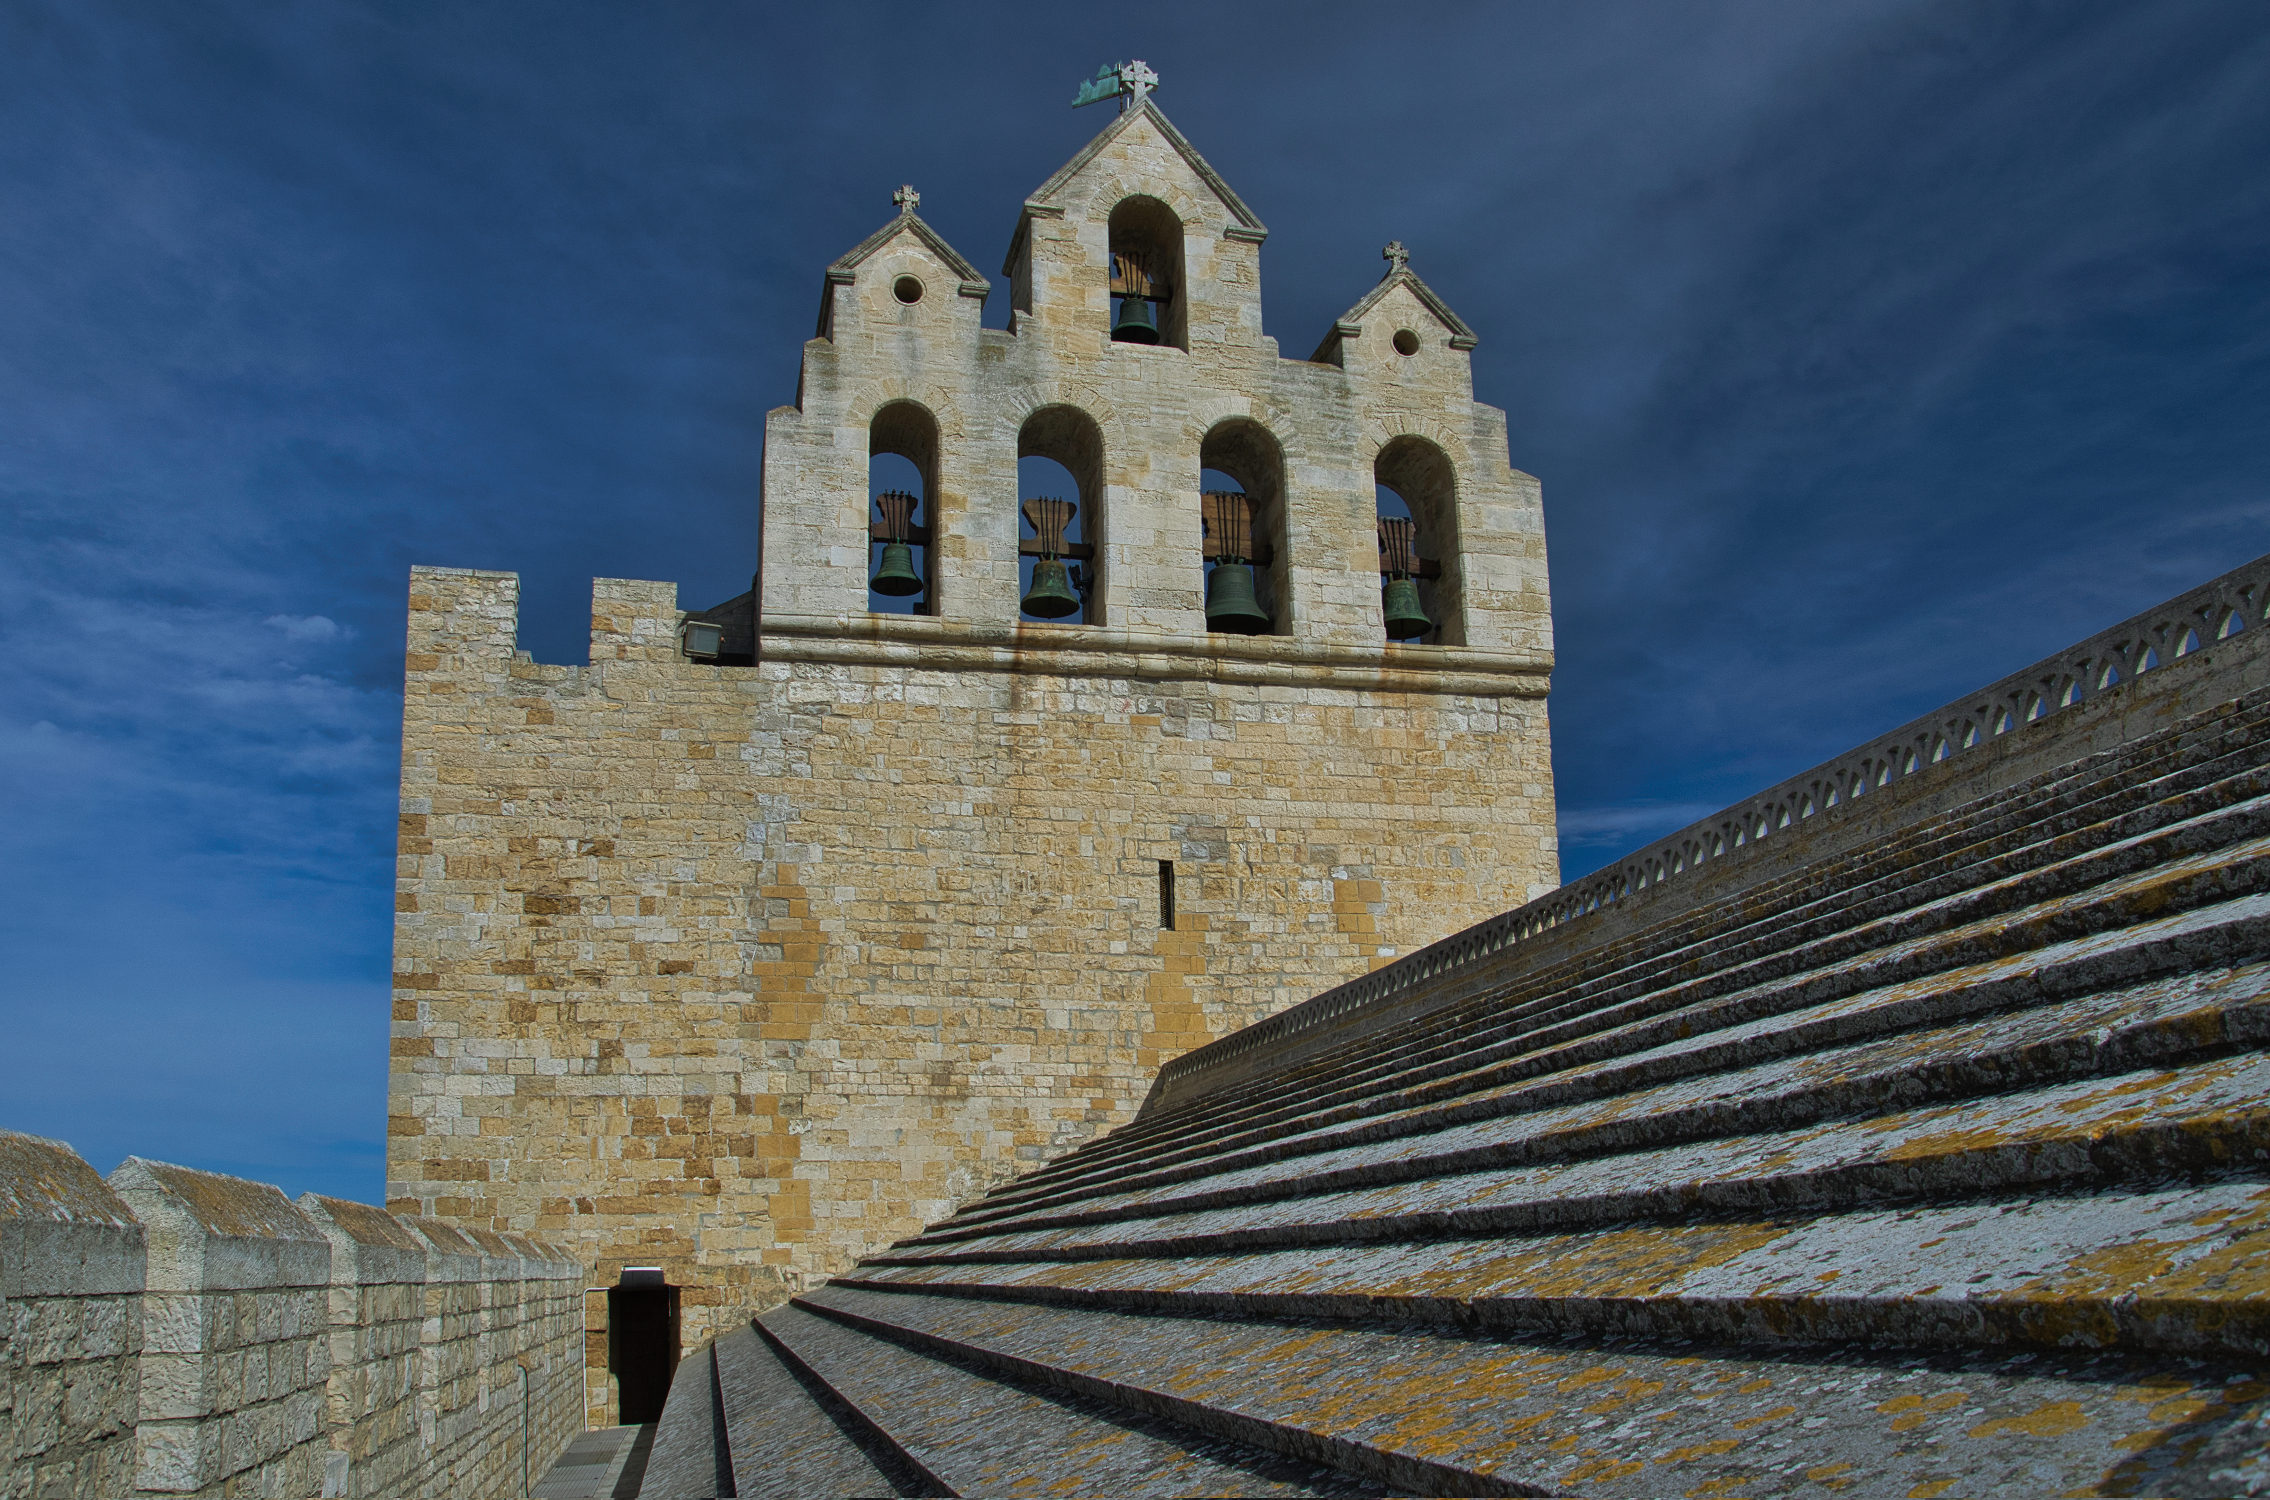 Chiesa fortezza Notre Dame de la Mere_Camargue_Provenza-9905.jpeg